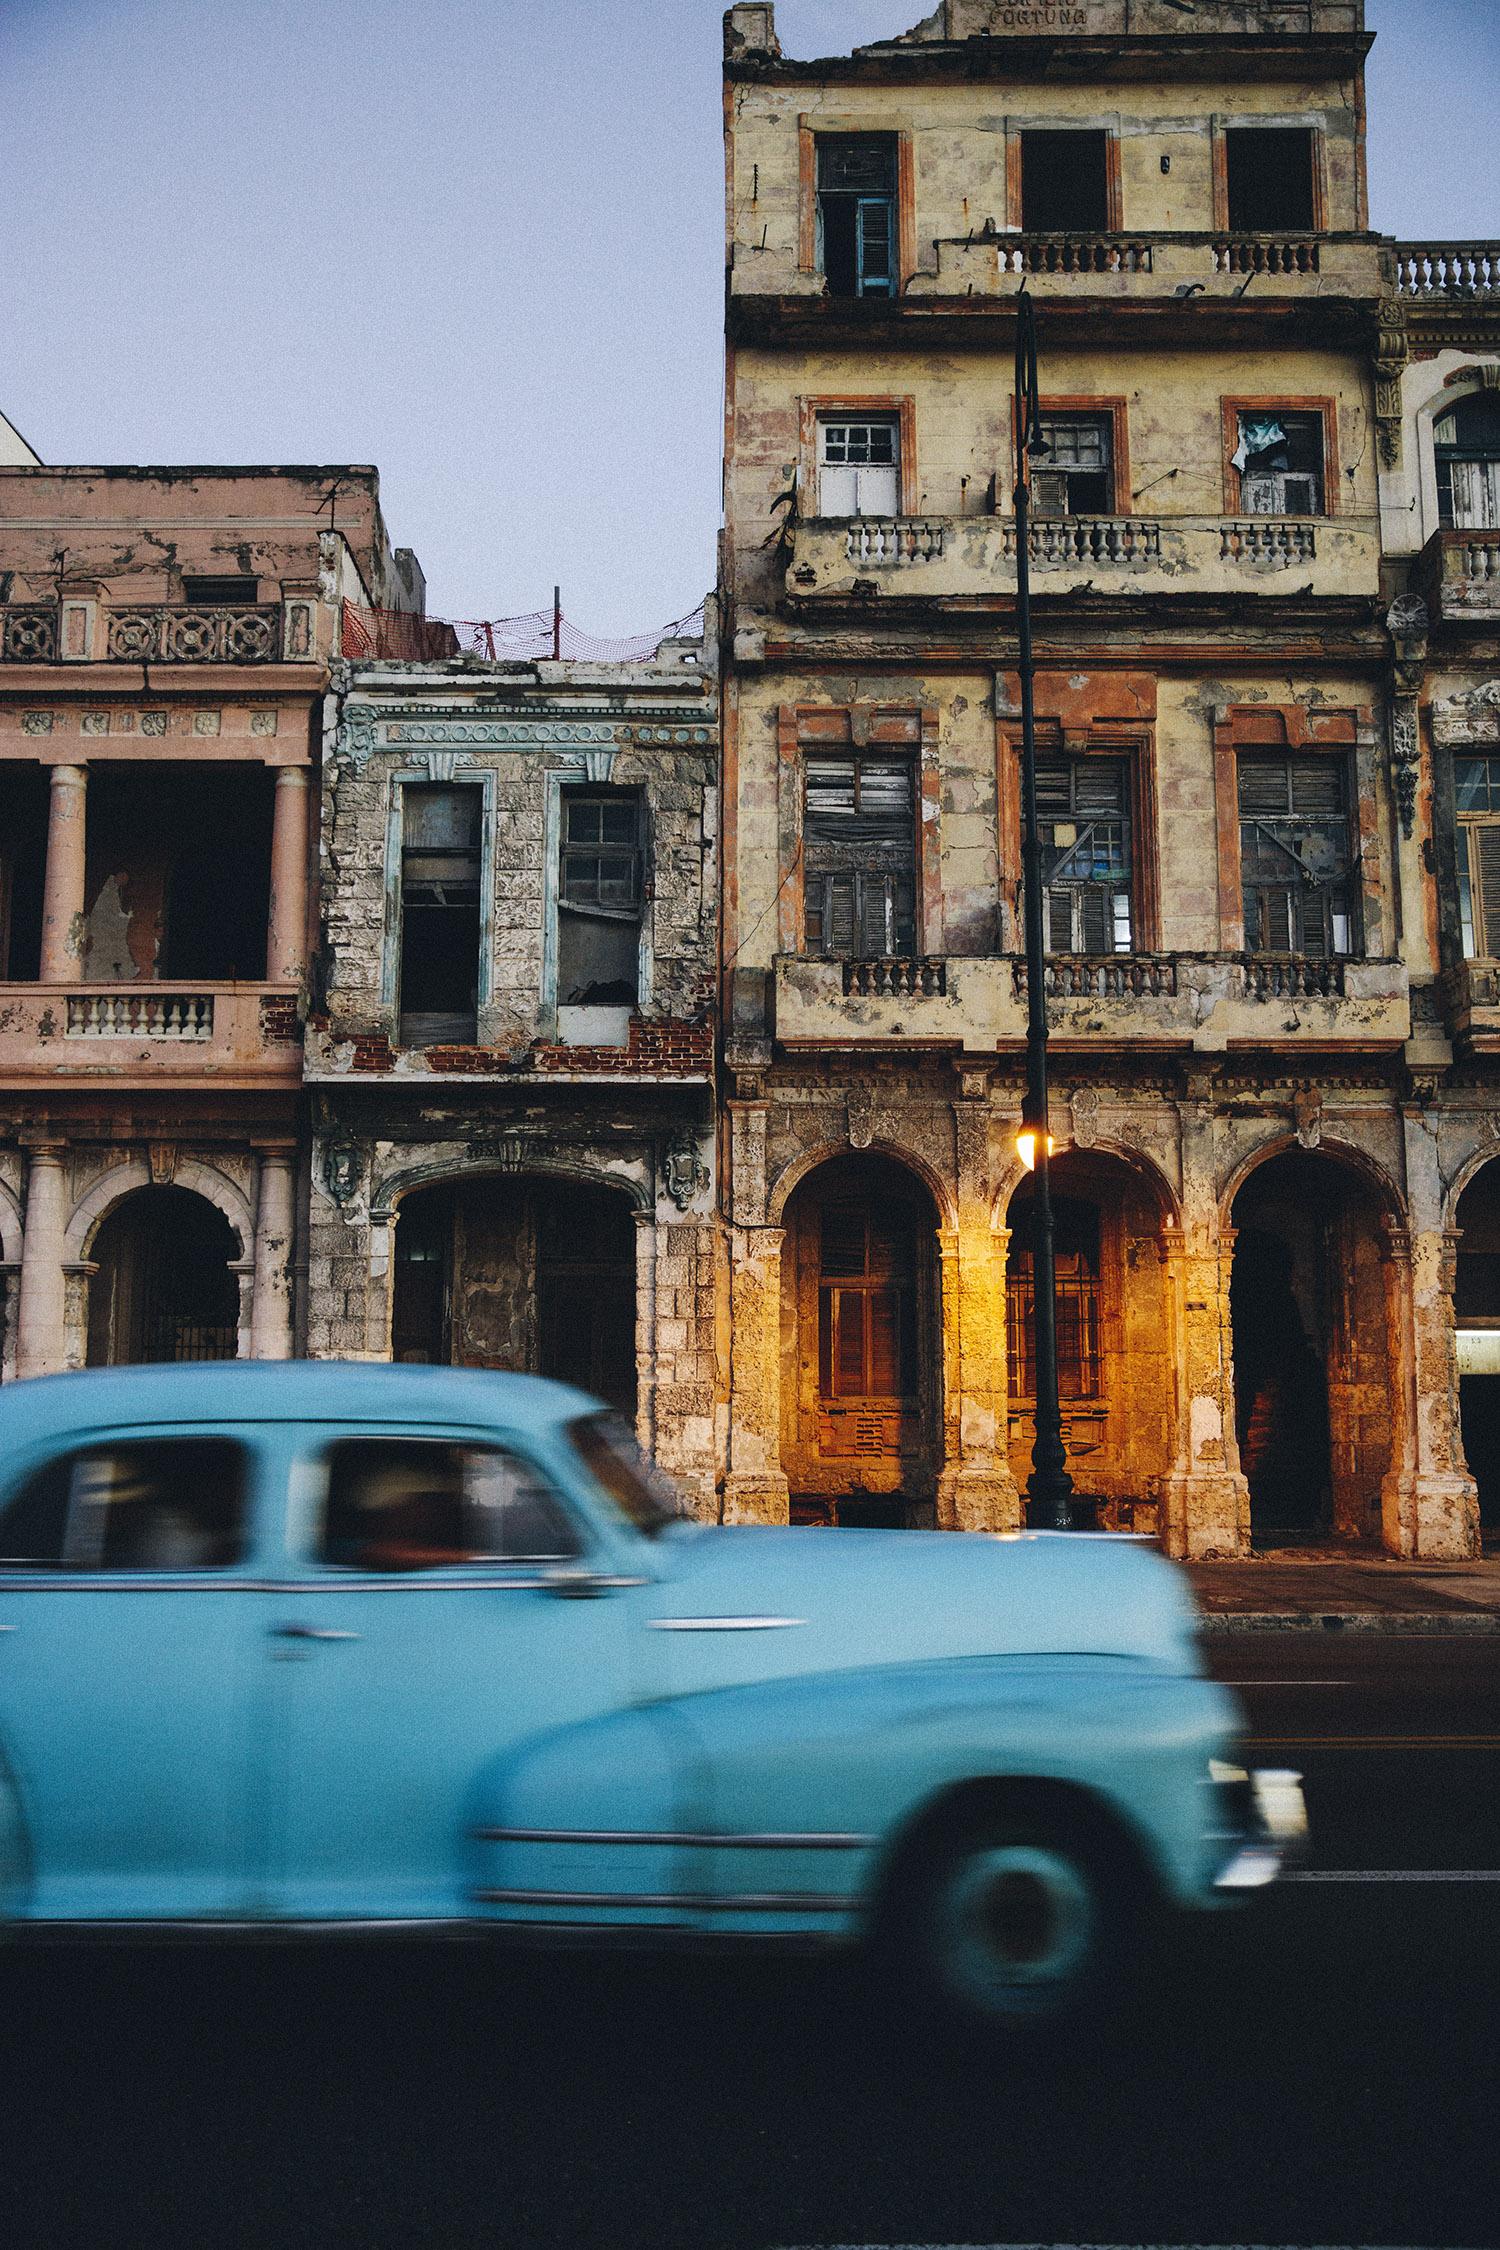 030_Cuba_-9304_V1_final.jpg